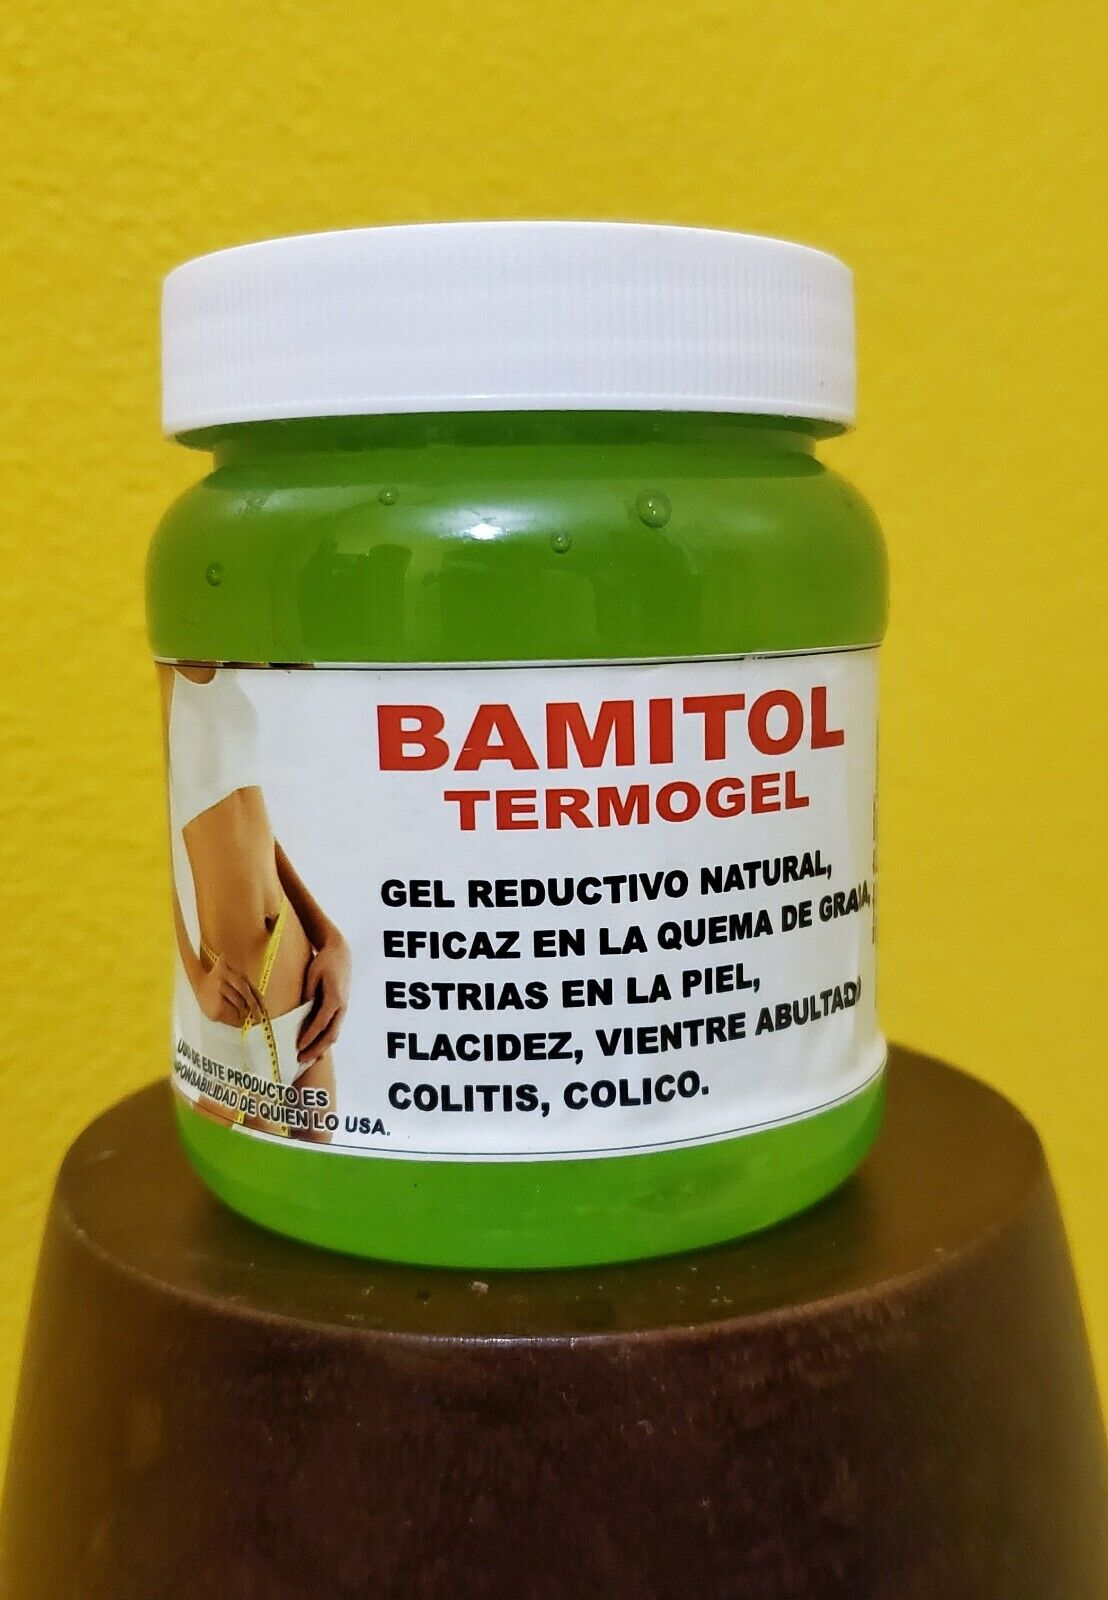 Bamitol